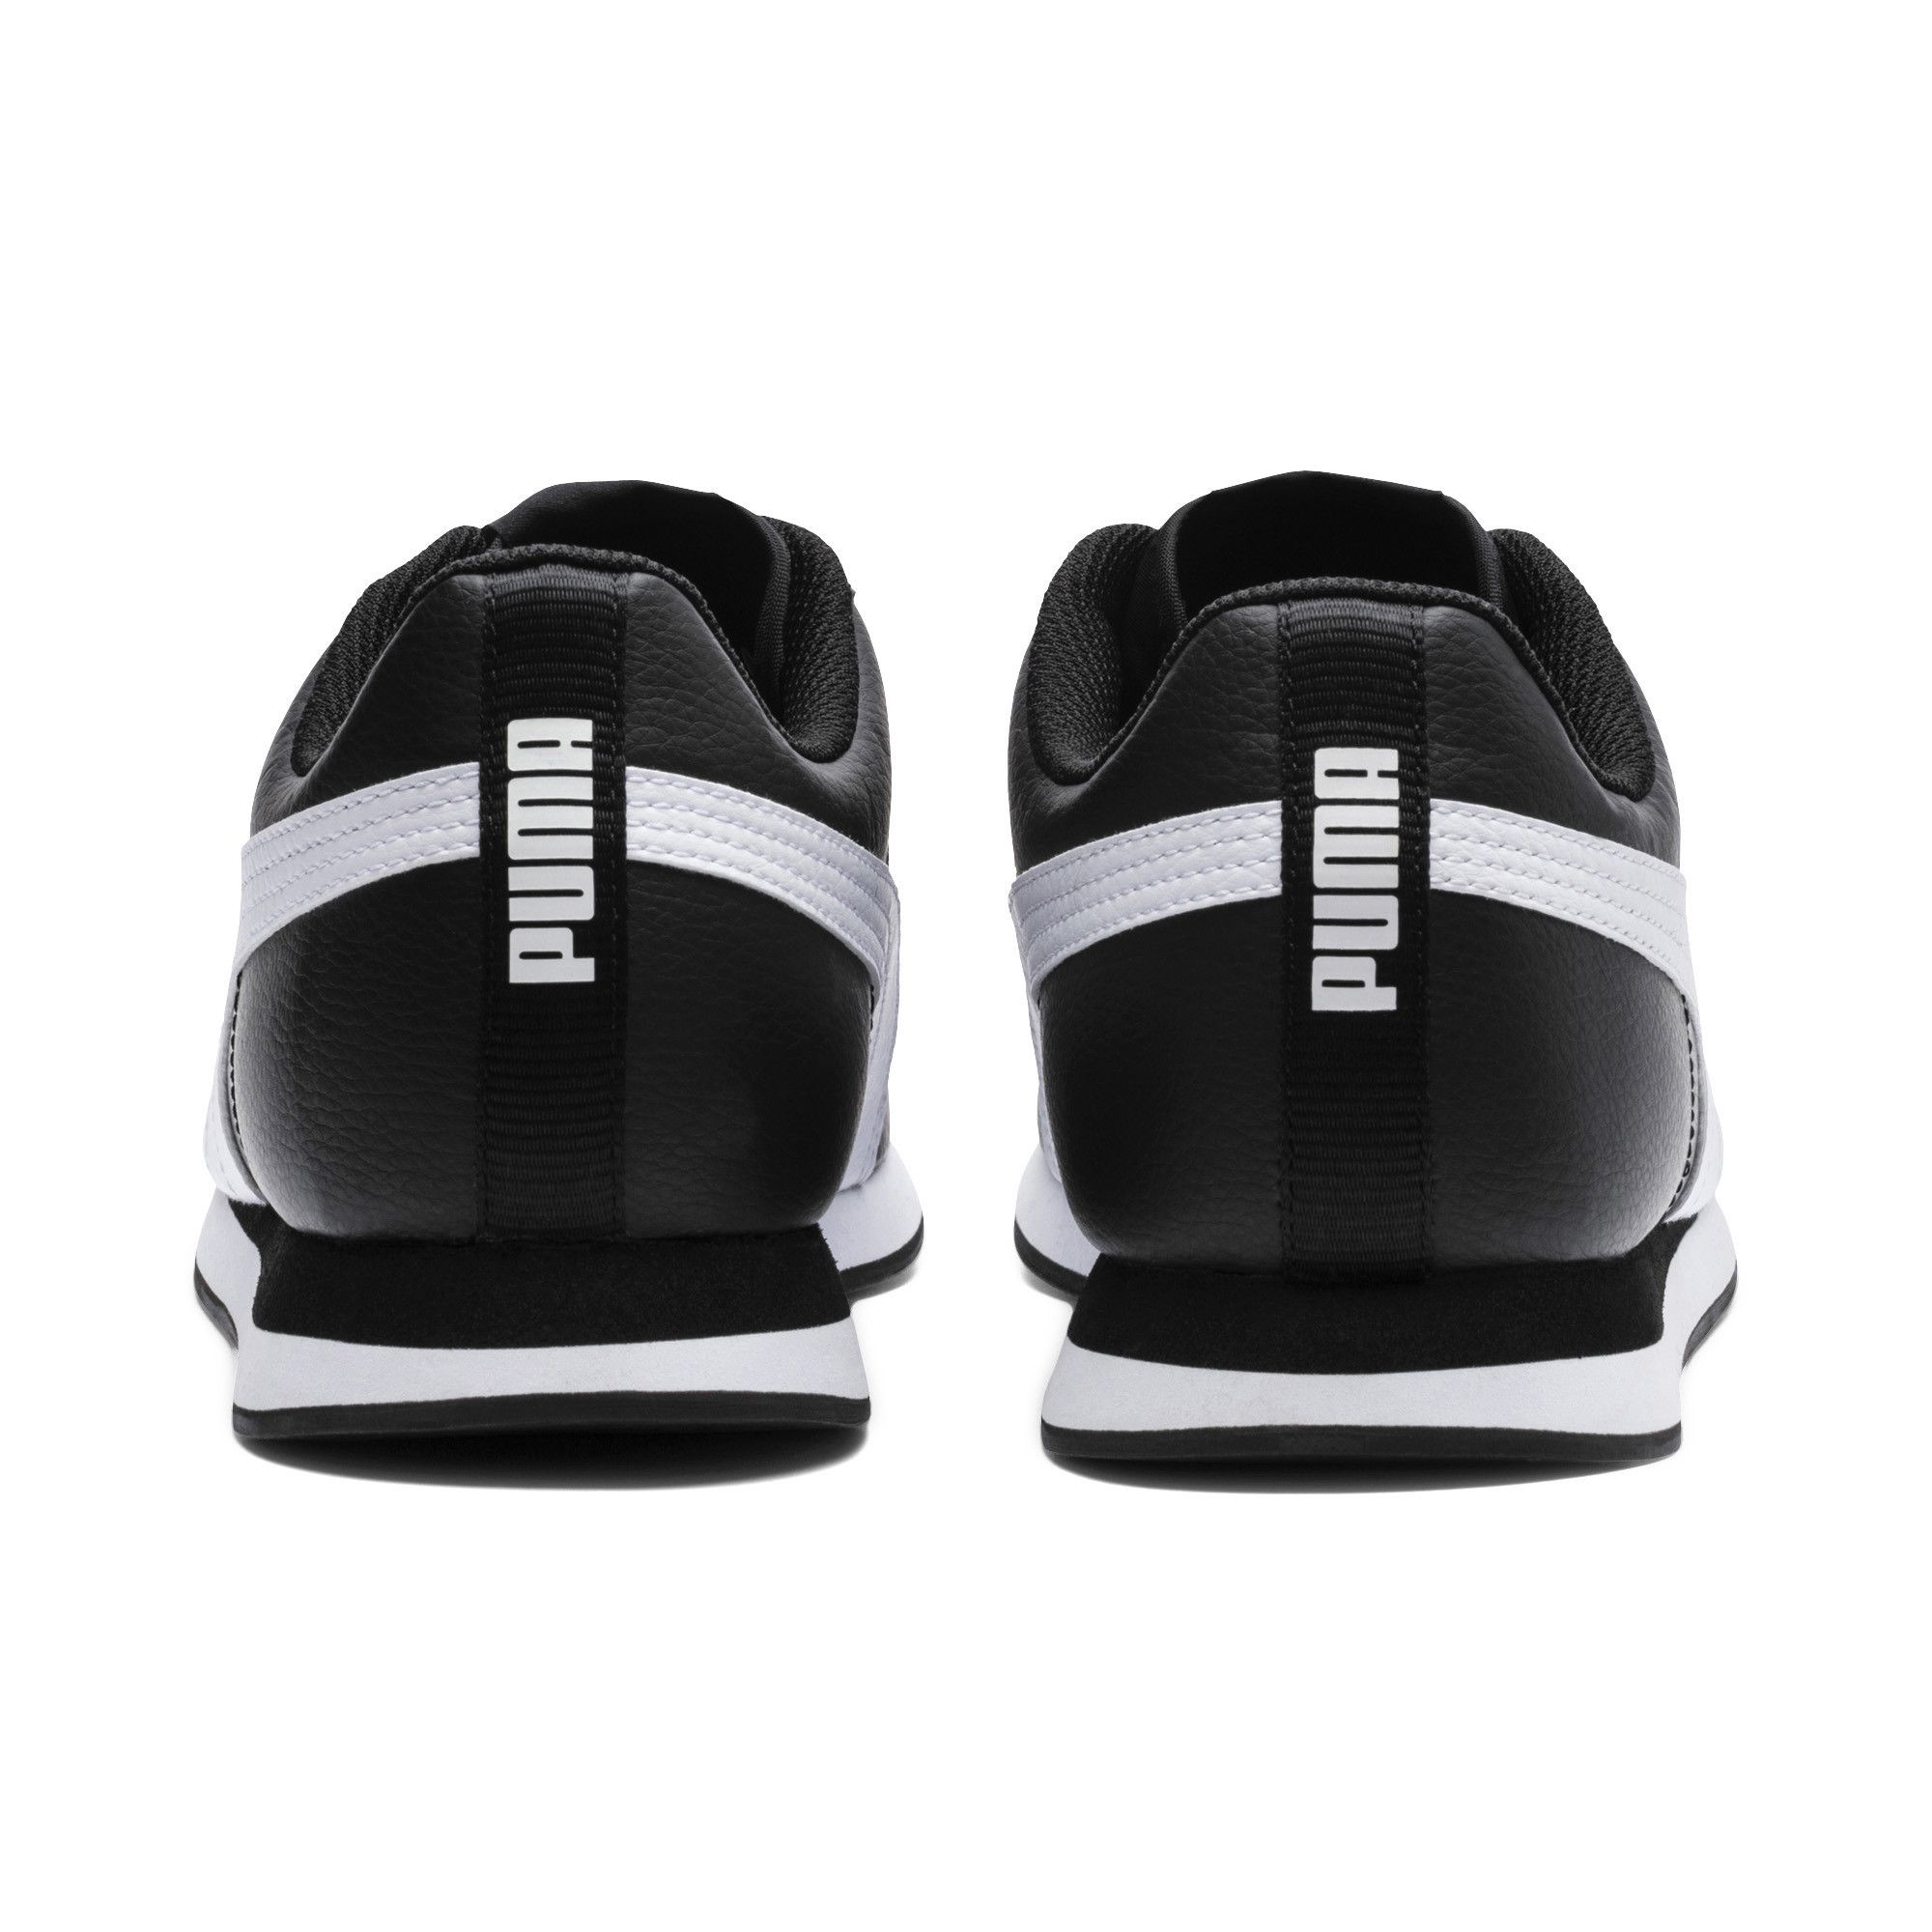 PUMA-Men-039-s-Turin-II-Sneakers thumbnail 35